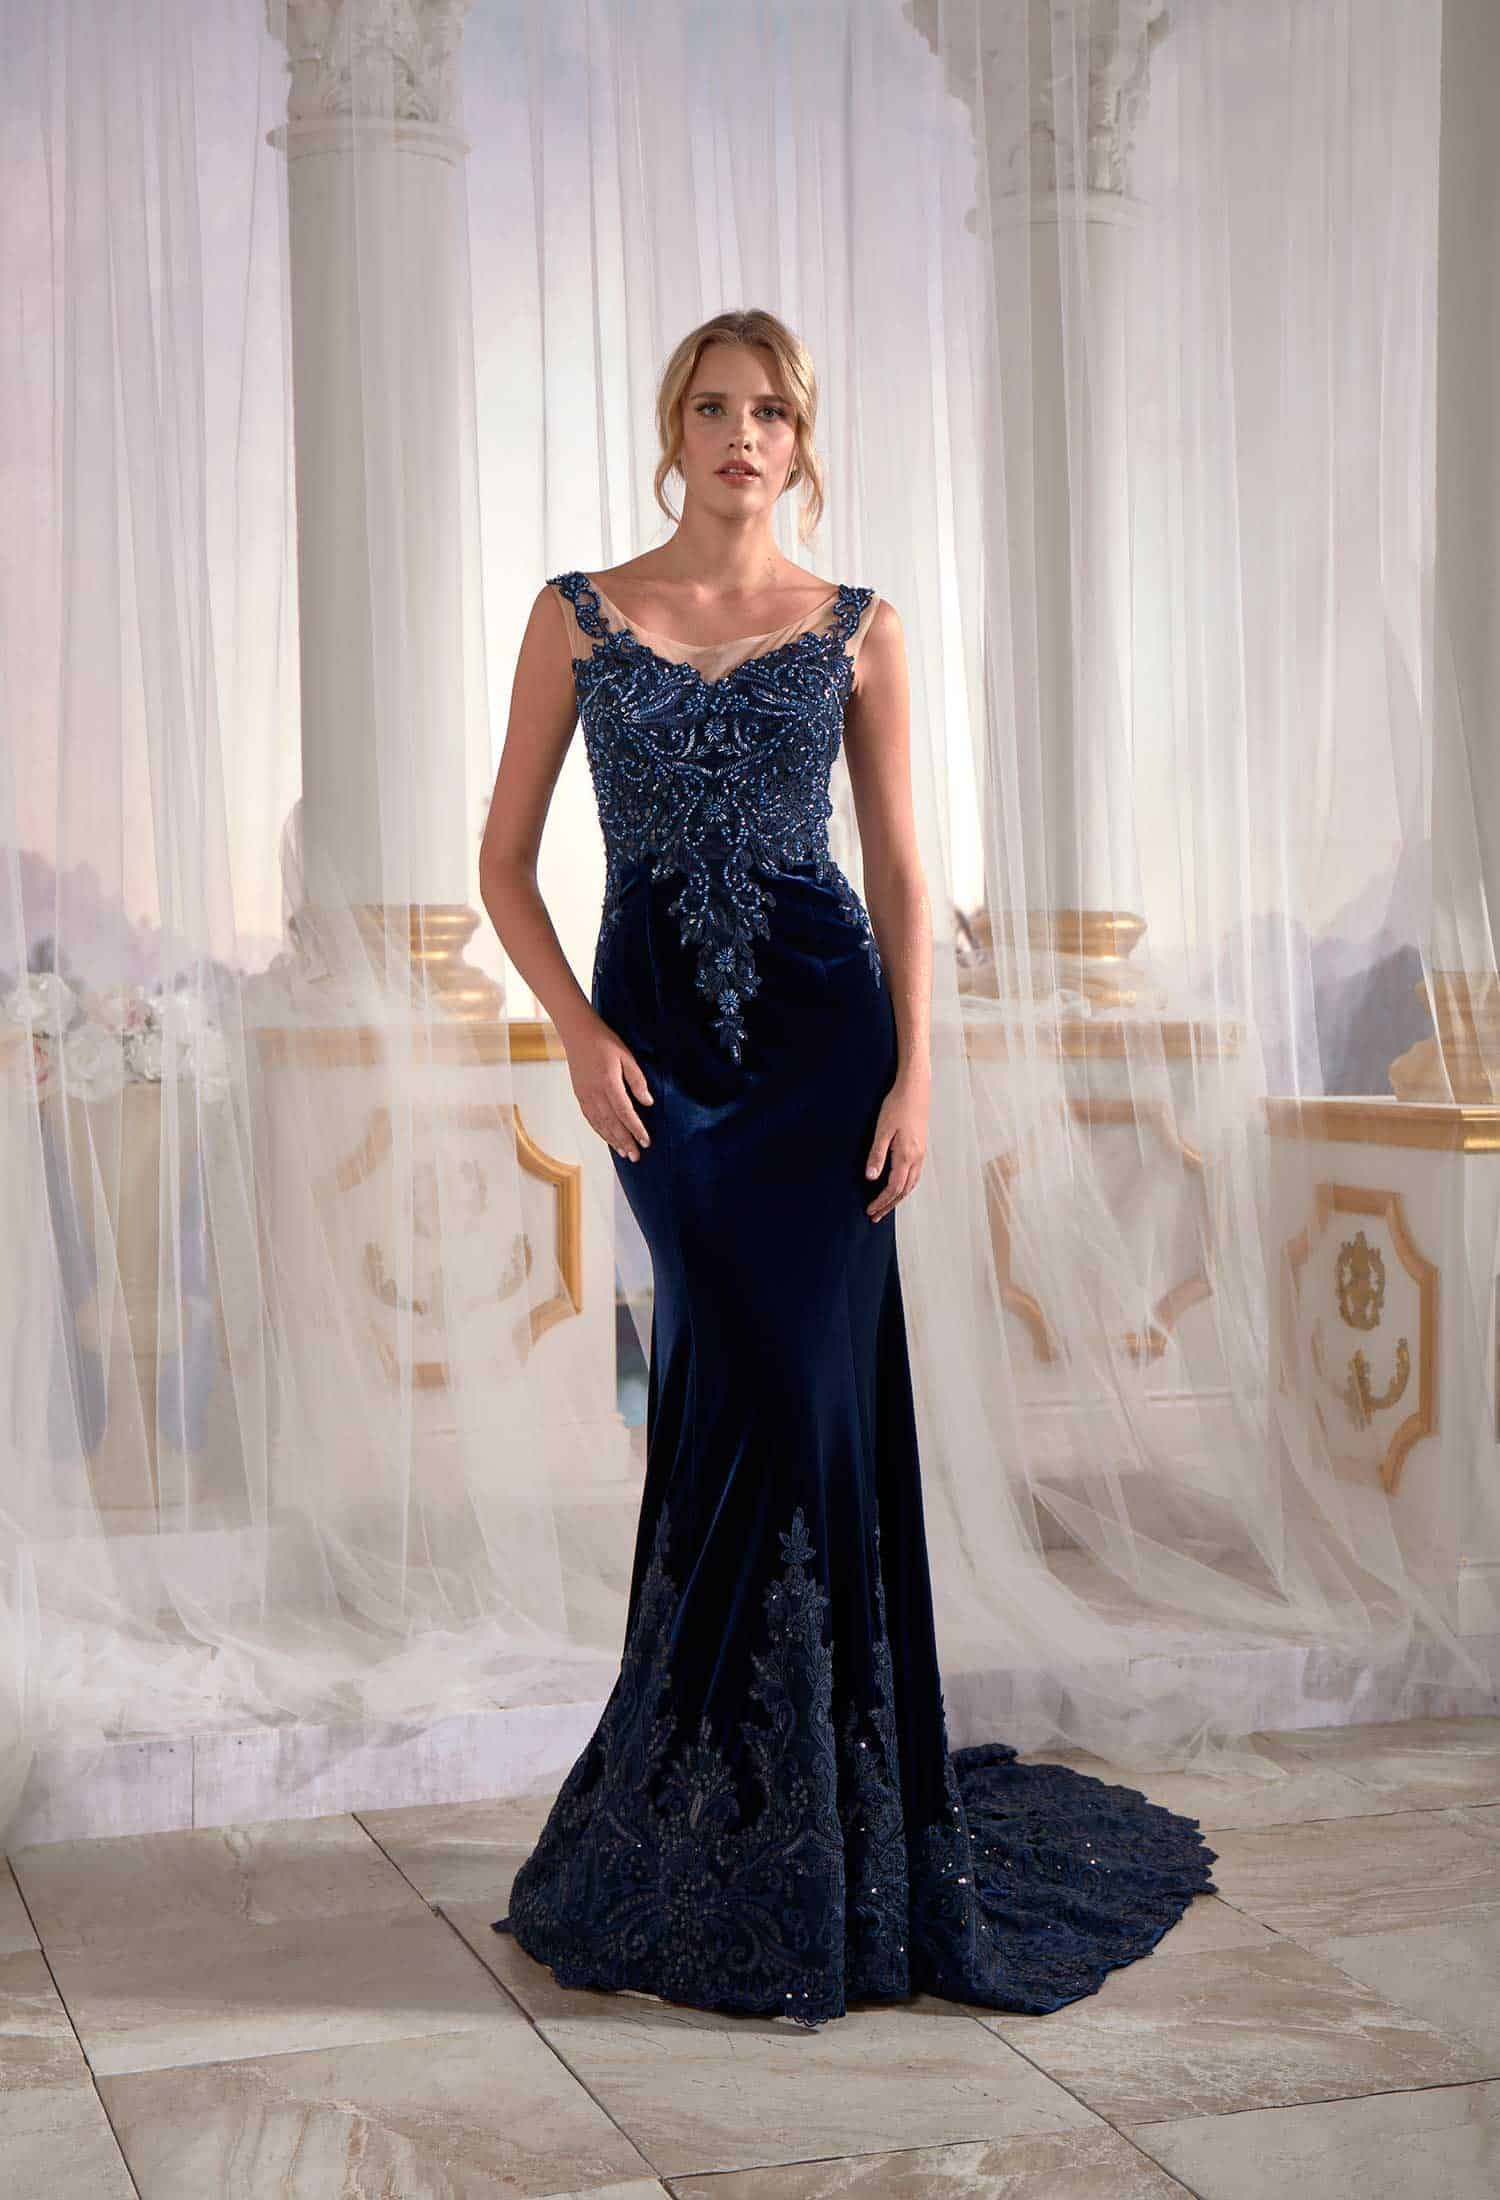 d443f47f0af Navy Blue Mermaid Maxi Prom Dress Velvet Open Back Needle   Thread ...